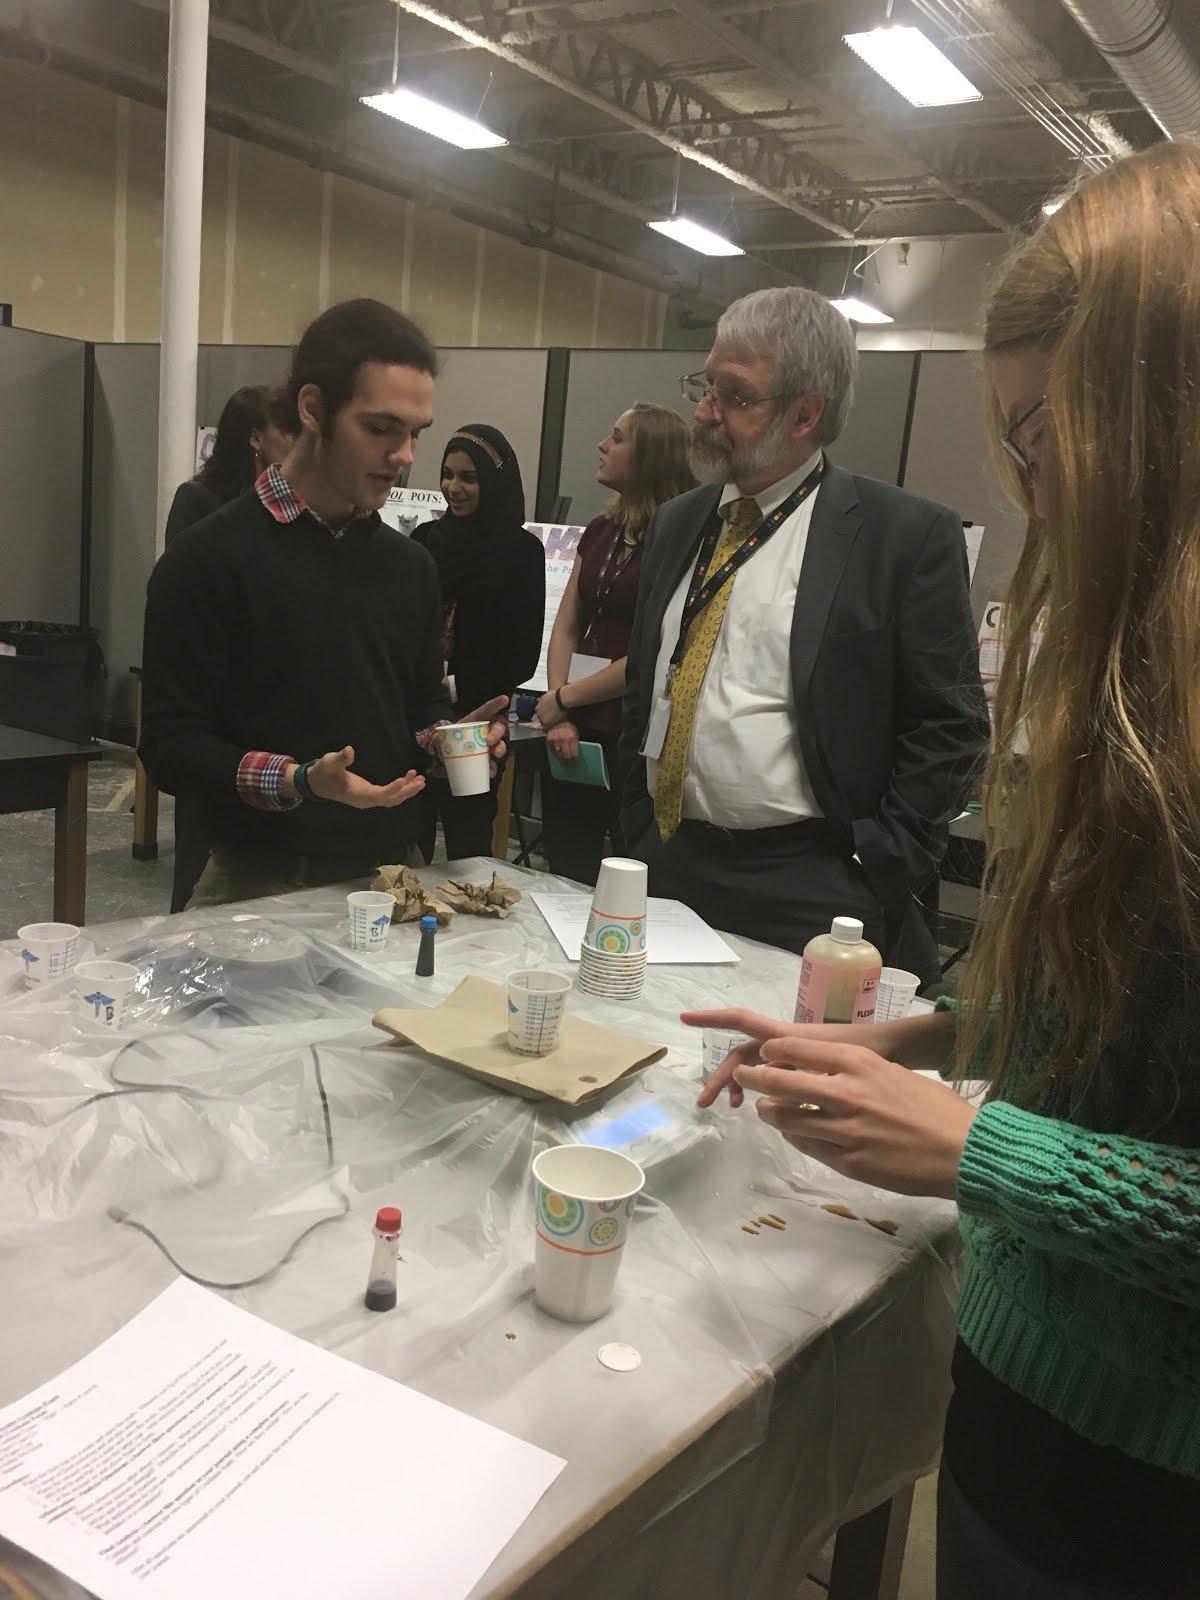 Ohio State Superintendent And Board Member Visit Dayton Regional STEM School